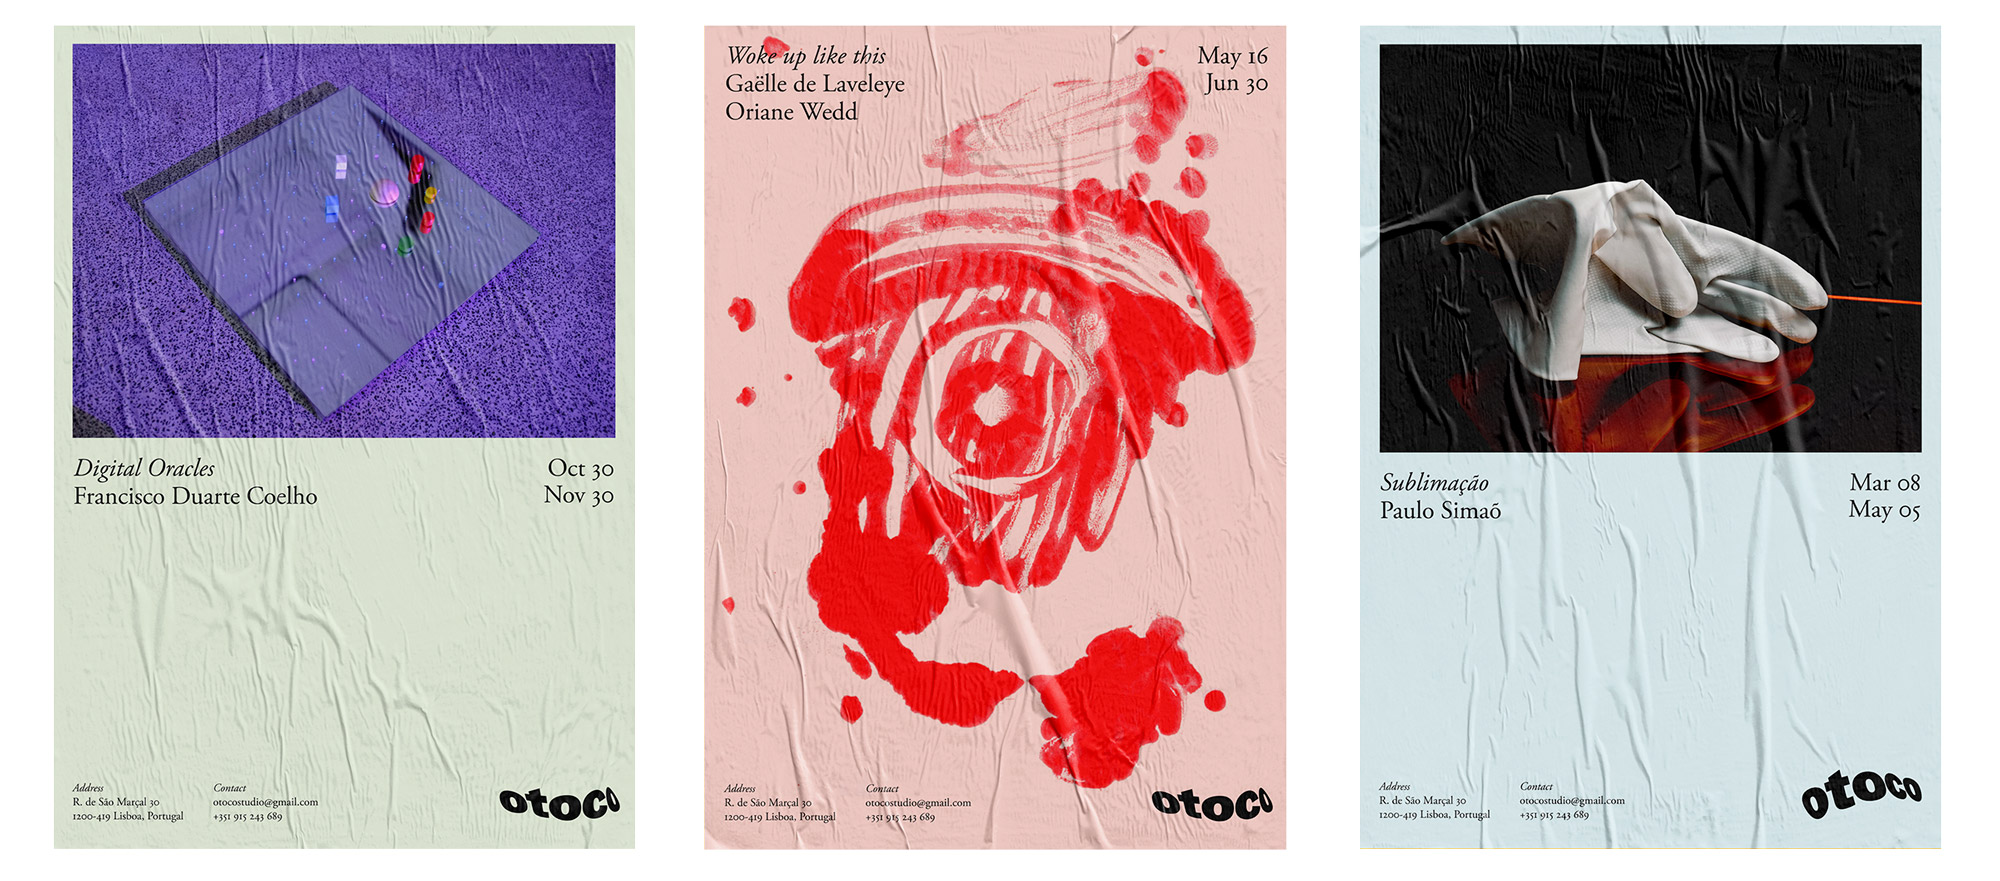 vlevle-otoco-Posters.jpg